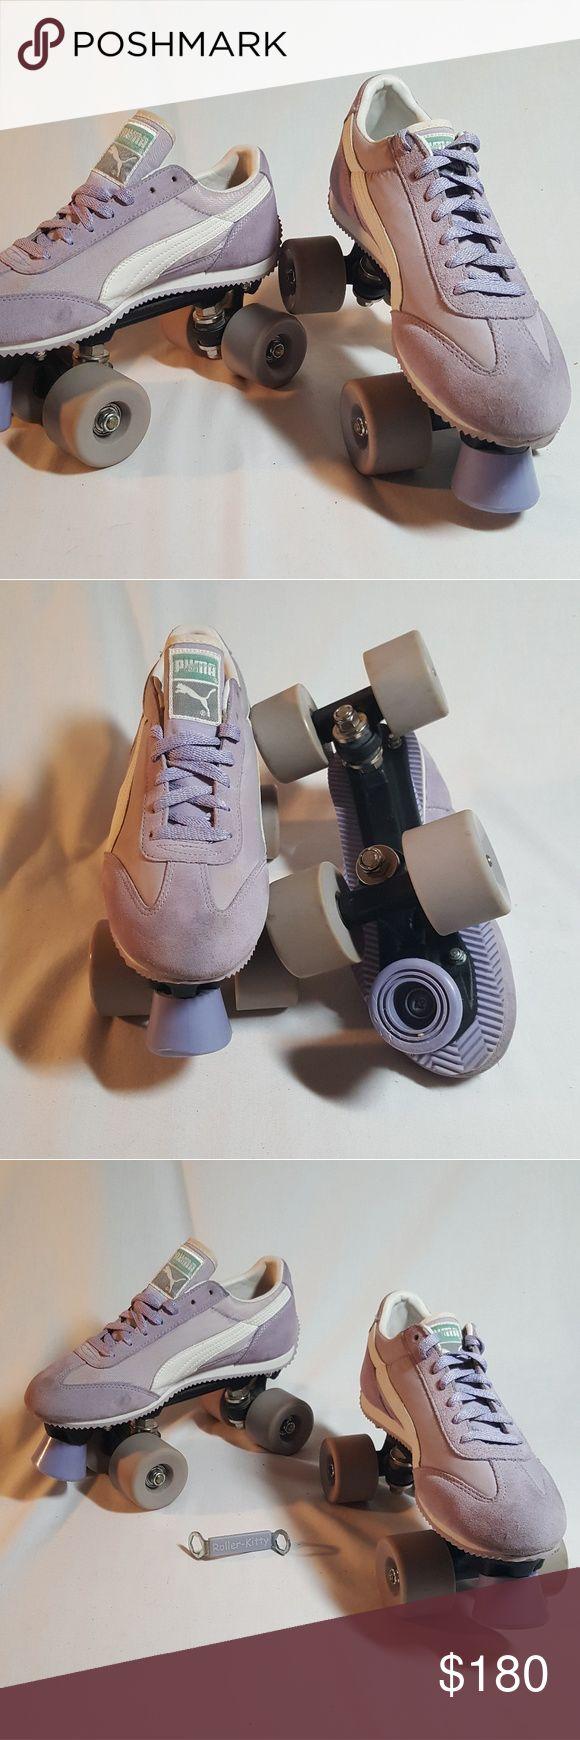 Roller shoes age - Rare Lavender Puma Roller Kitty Roller Skates